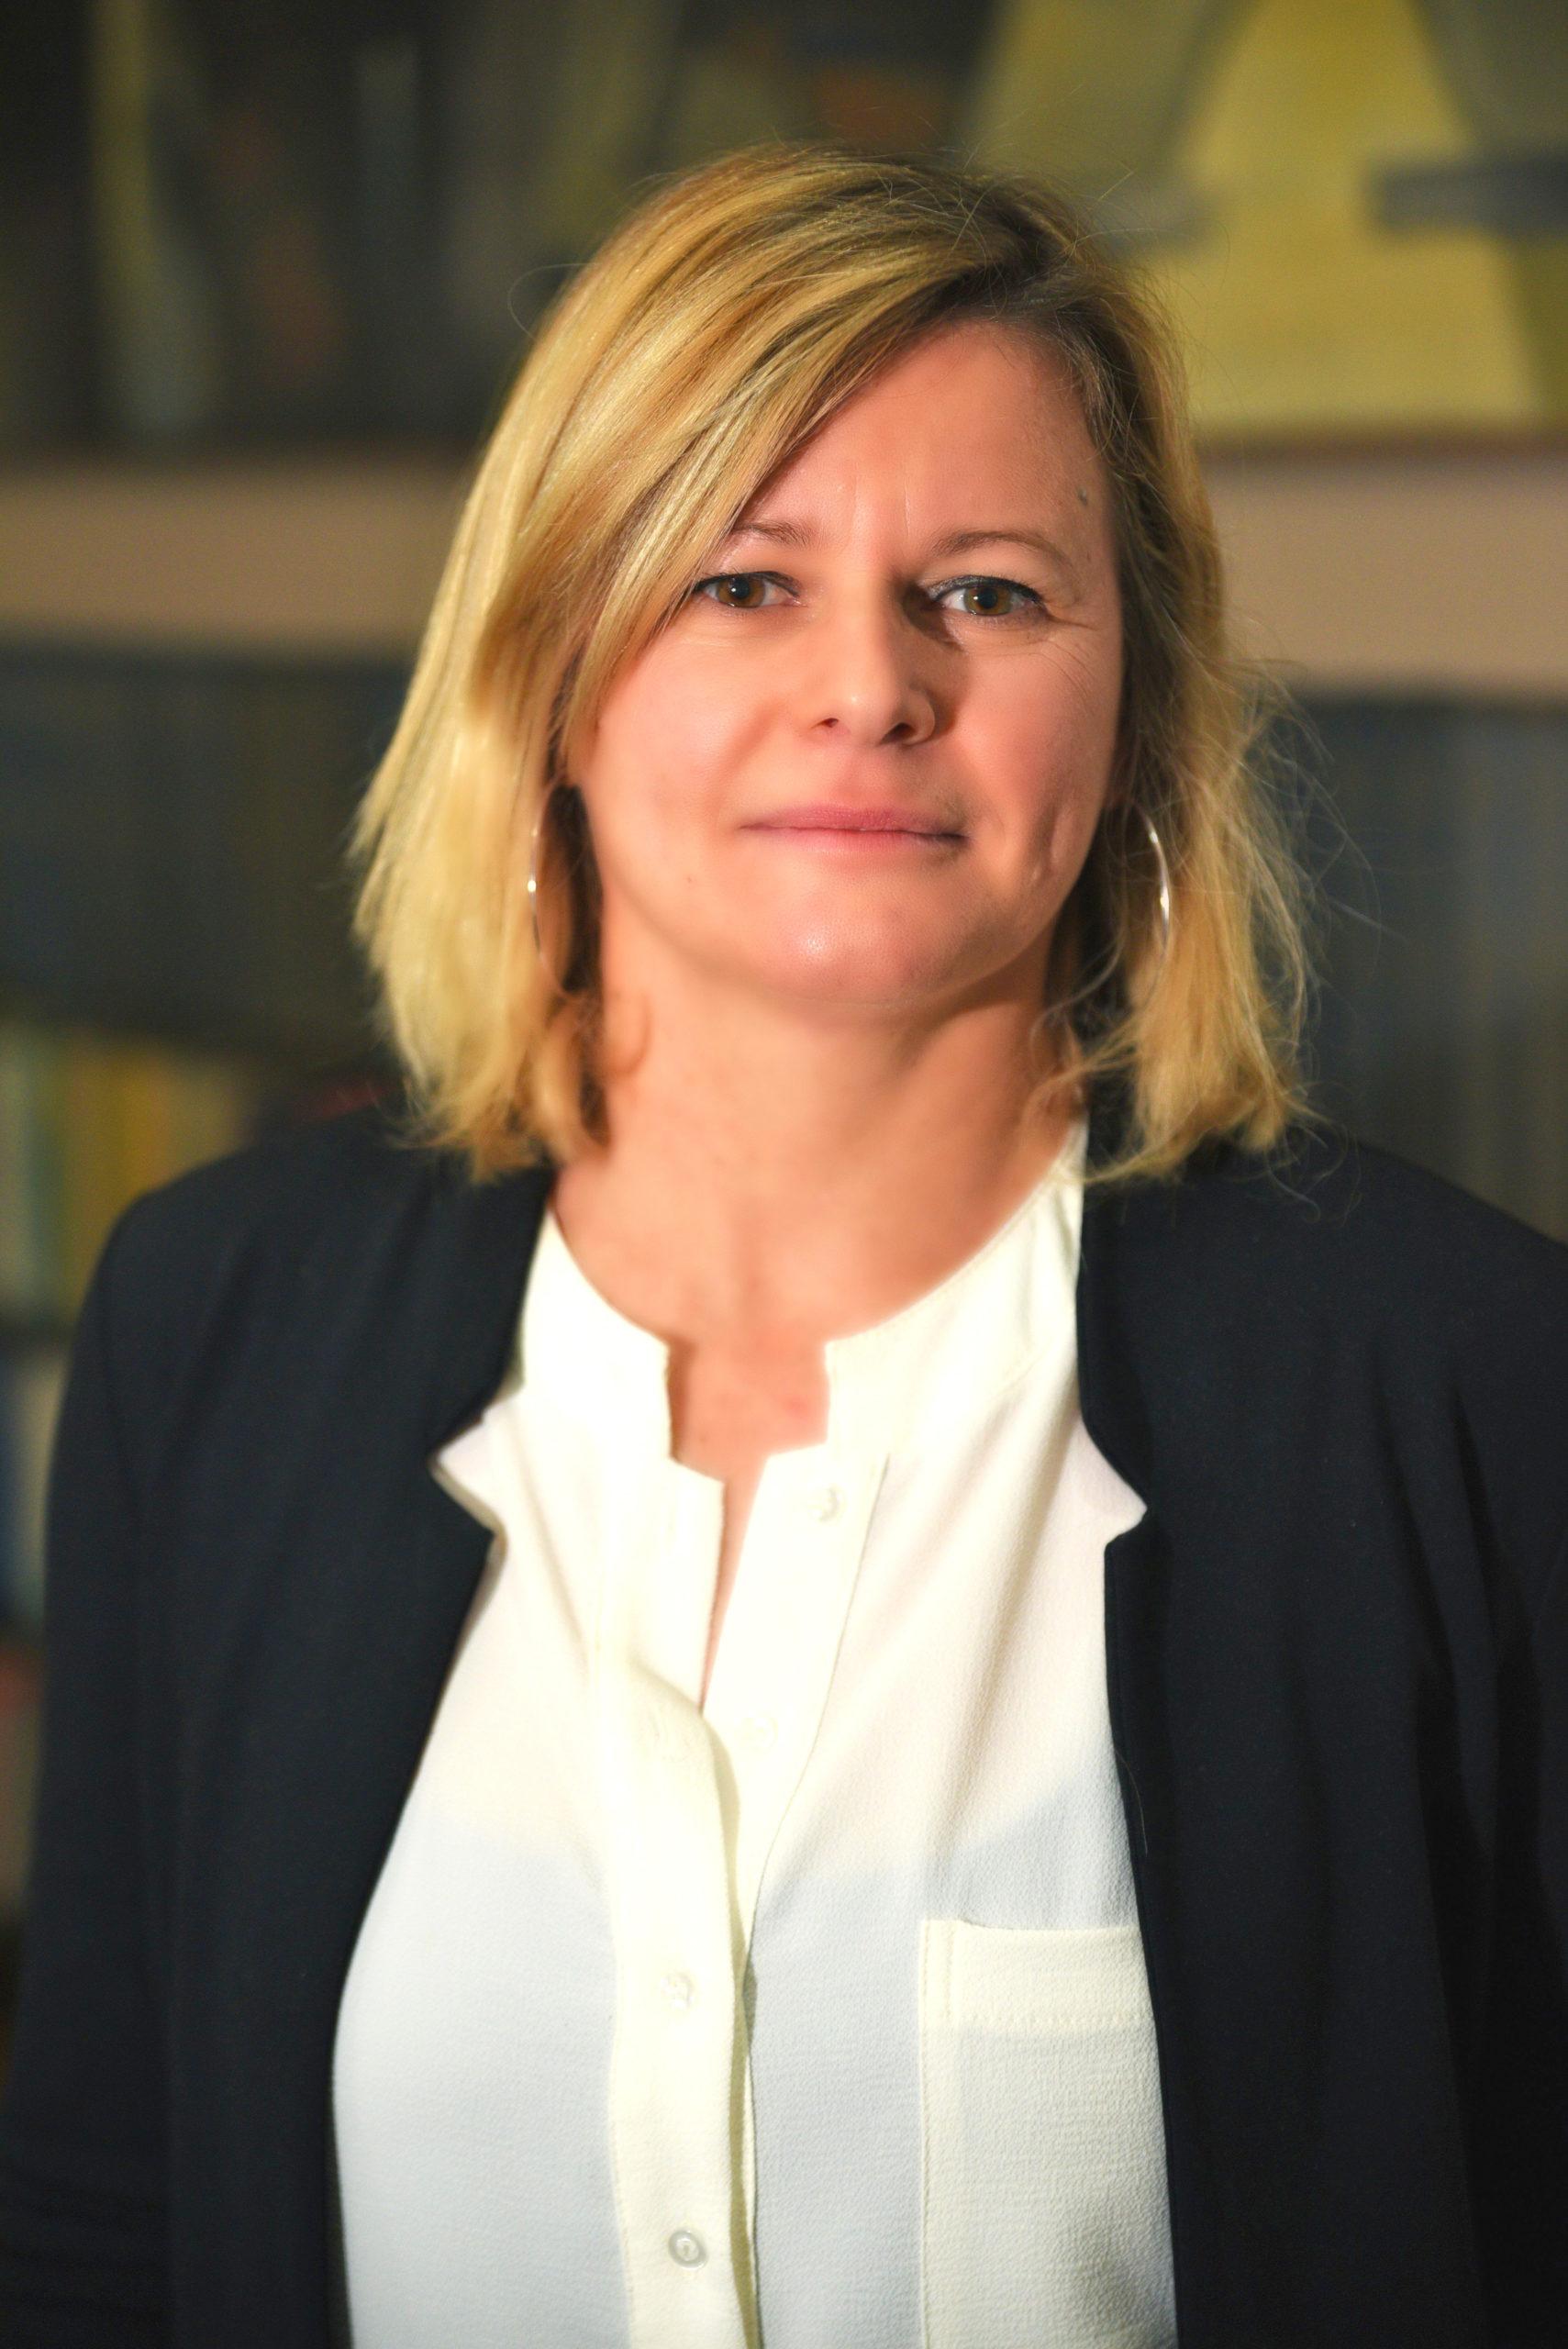 Avvocato-Roberta-Mauro